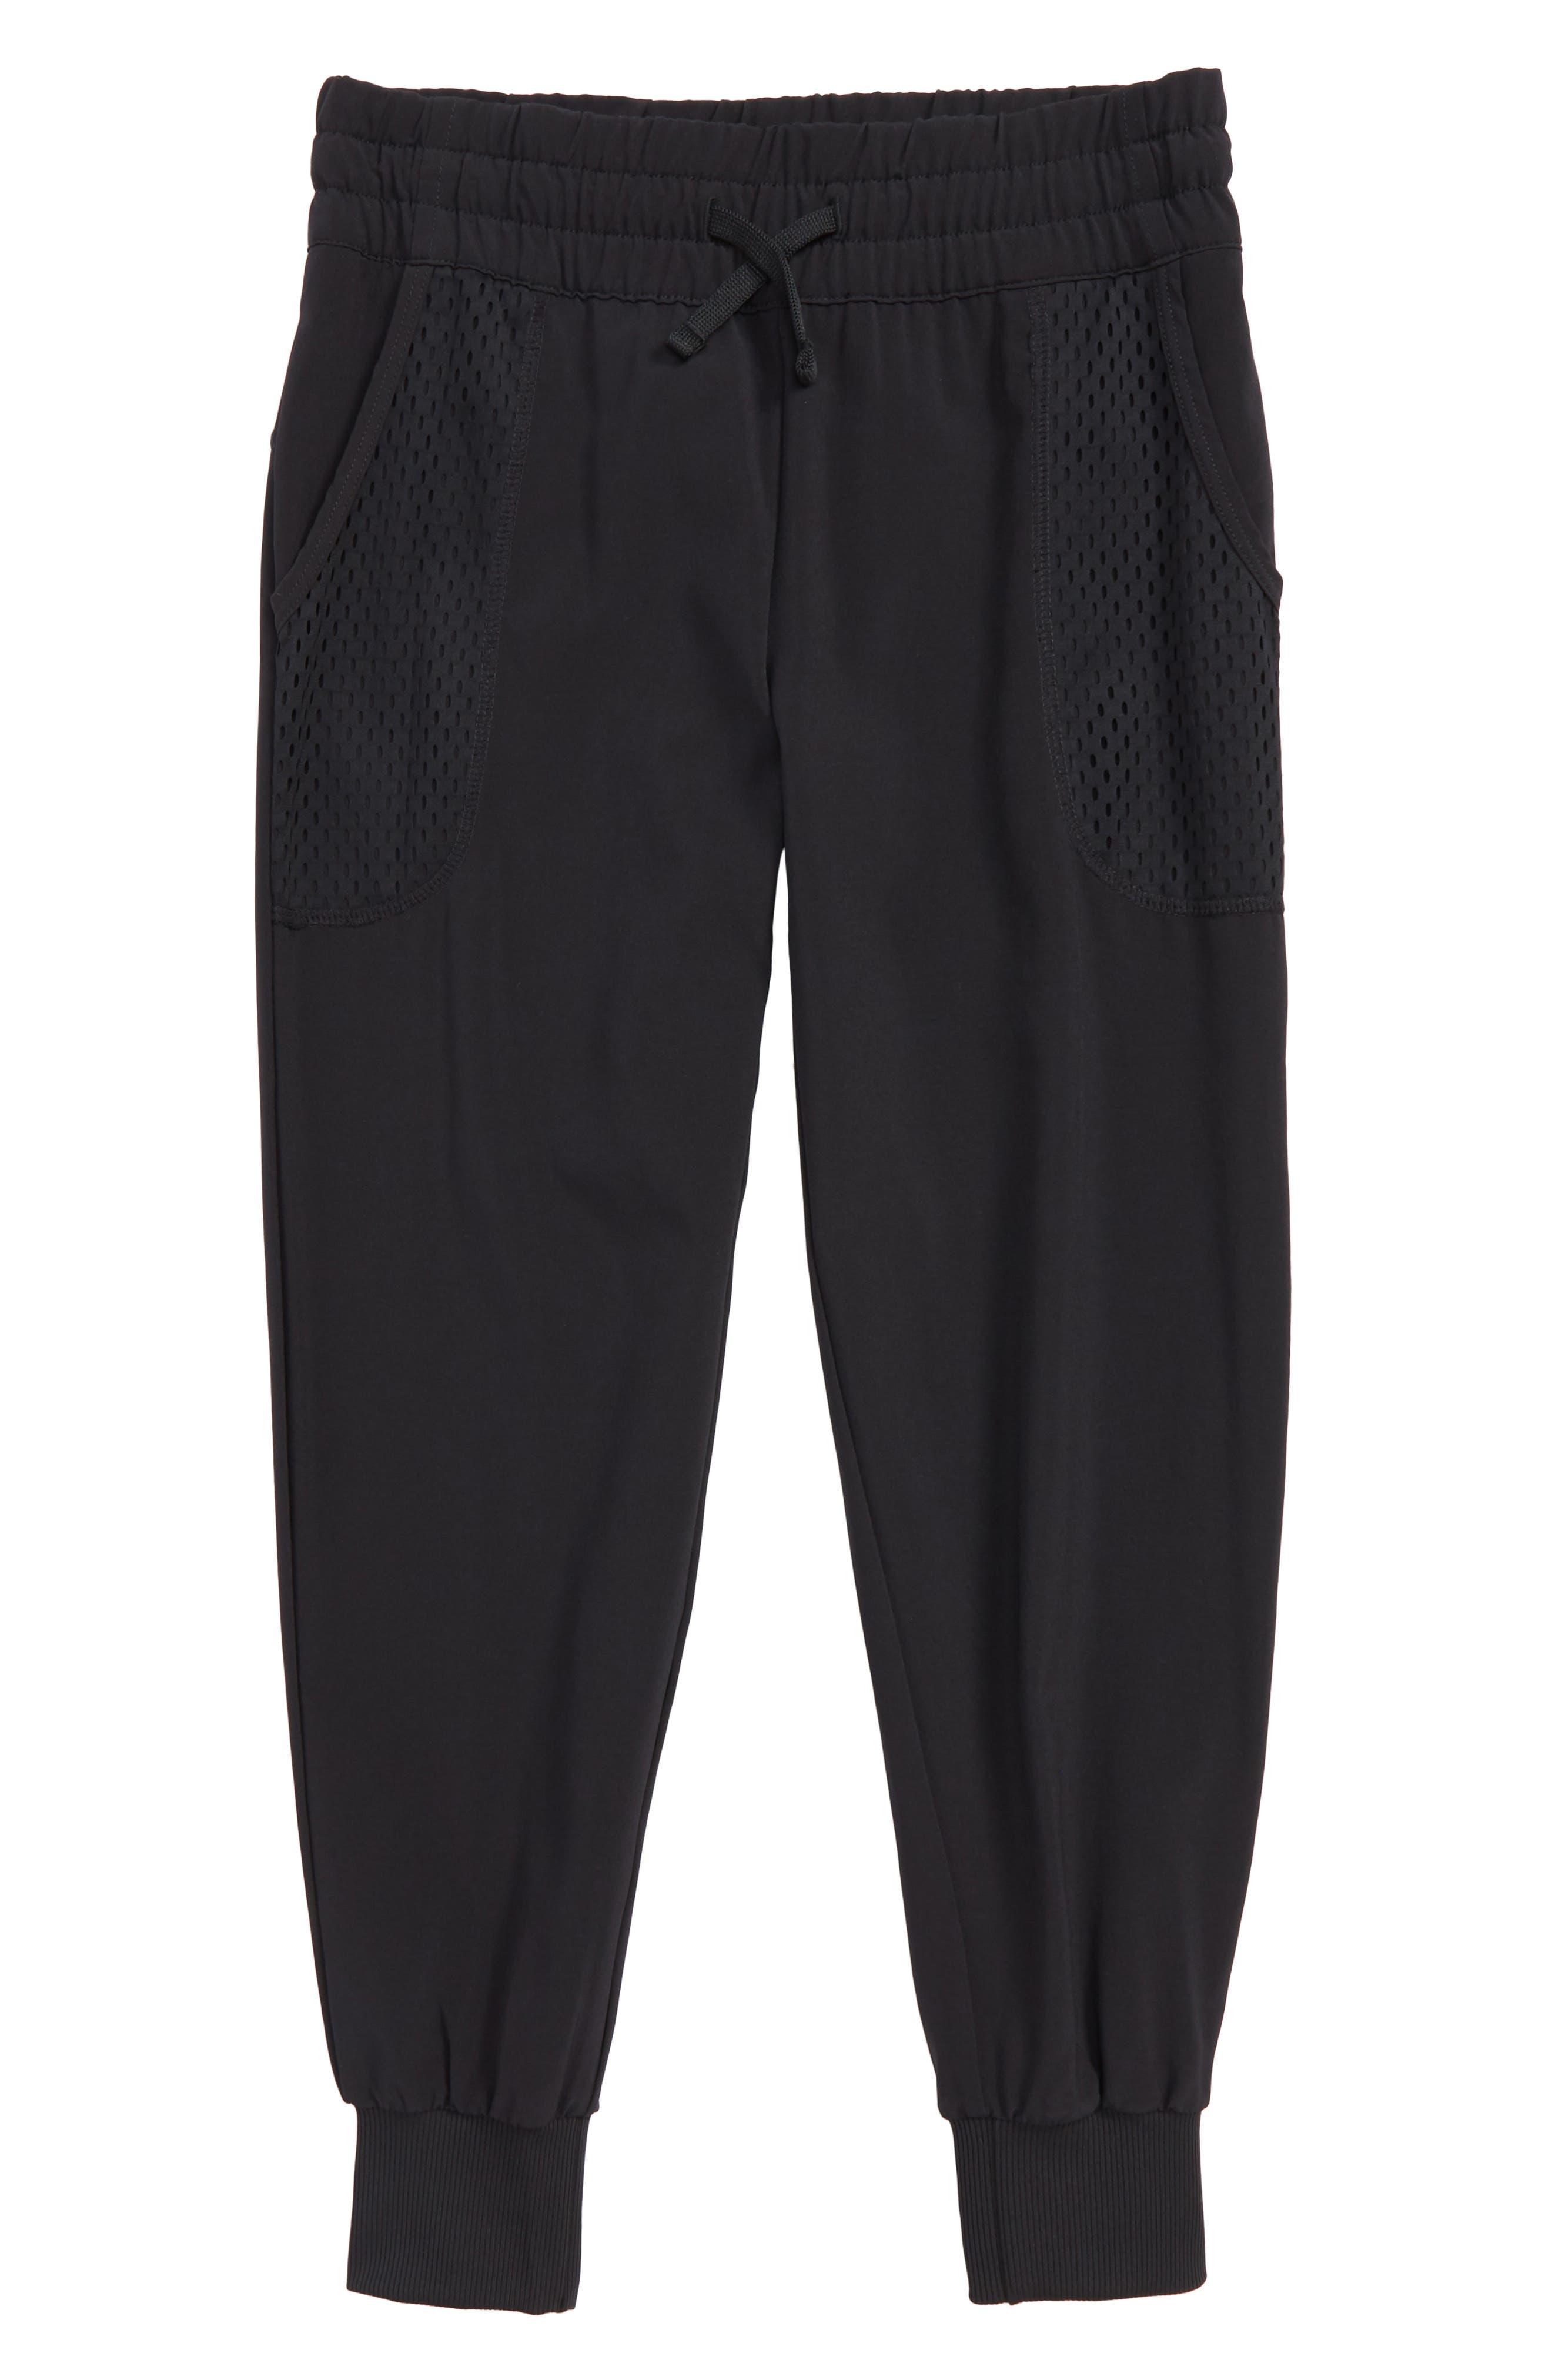 Mesh Pocket Jogger Pants,                         Main,                         color, Black